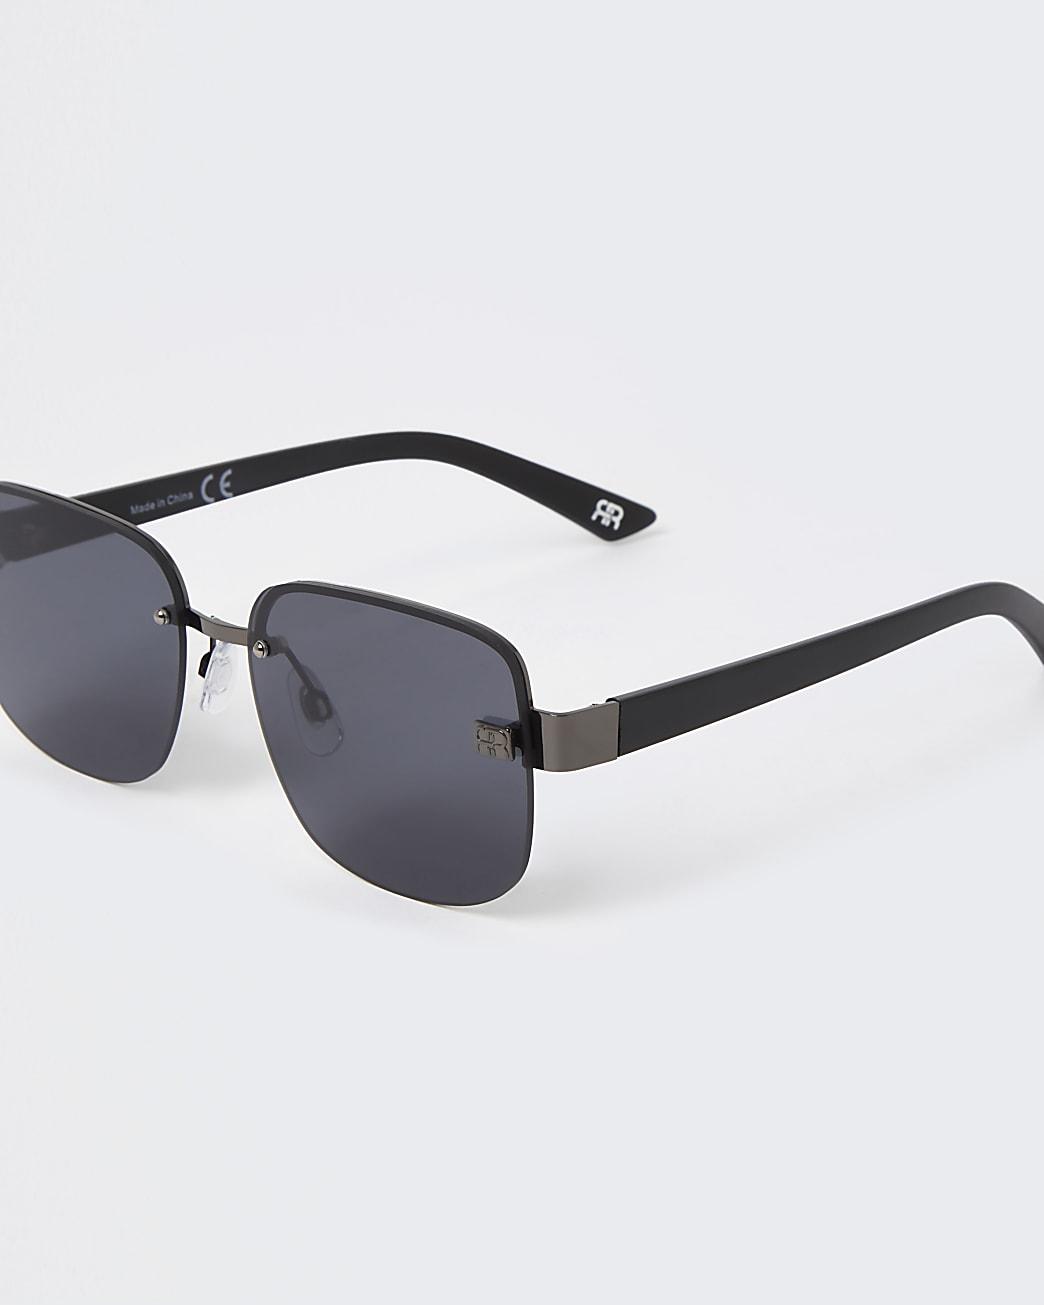 Grey rimless aviator sunglasses